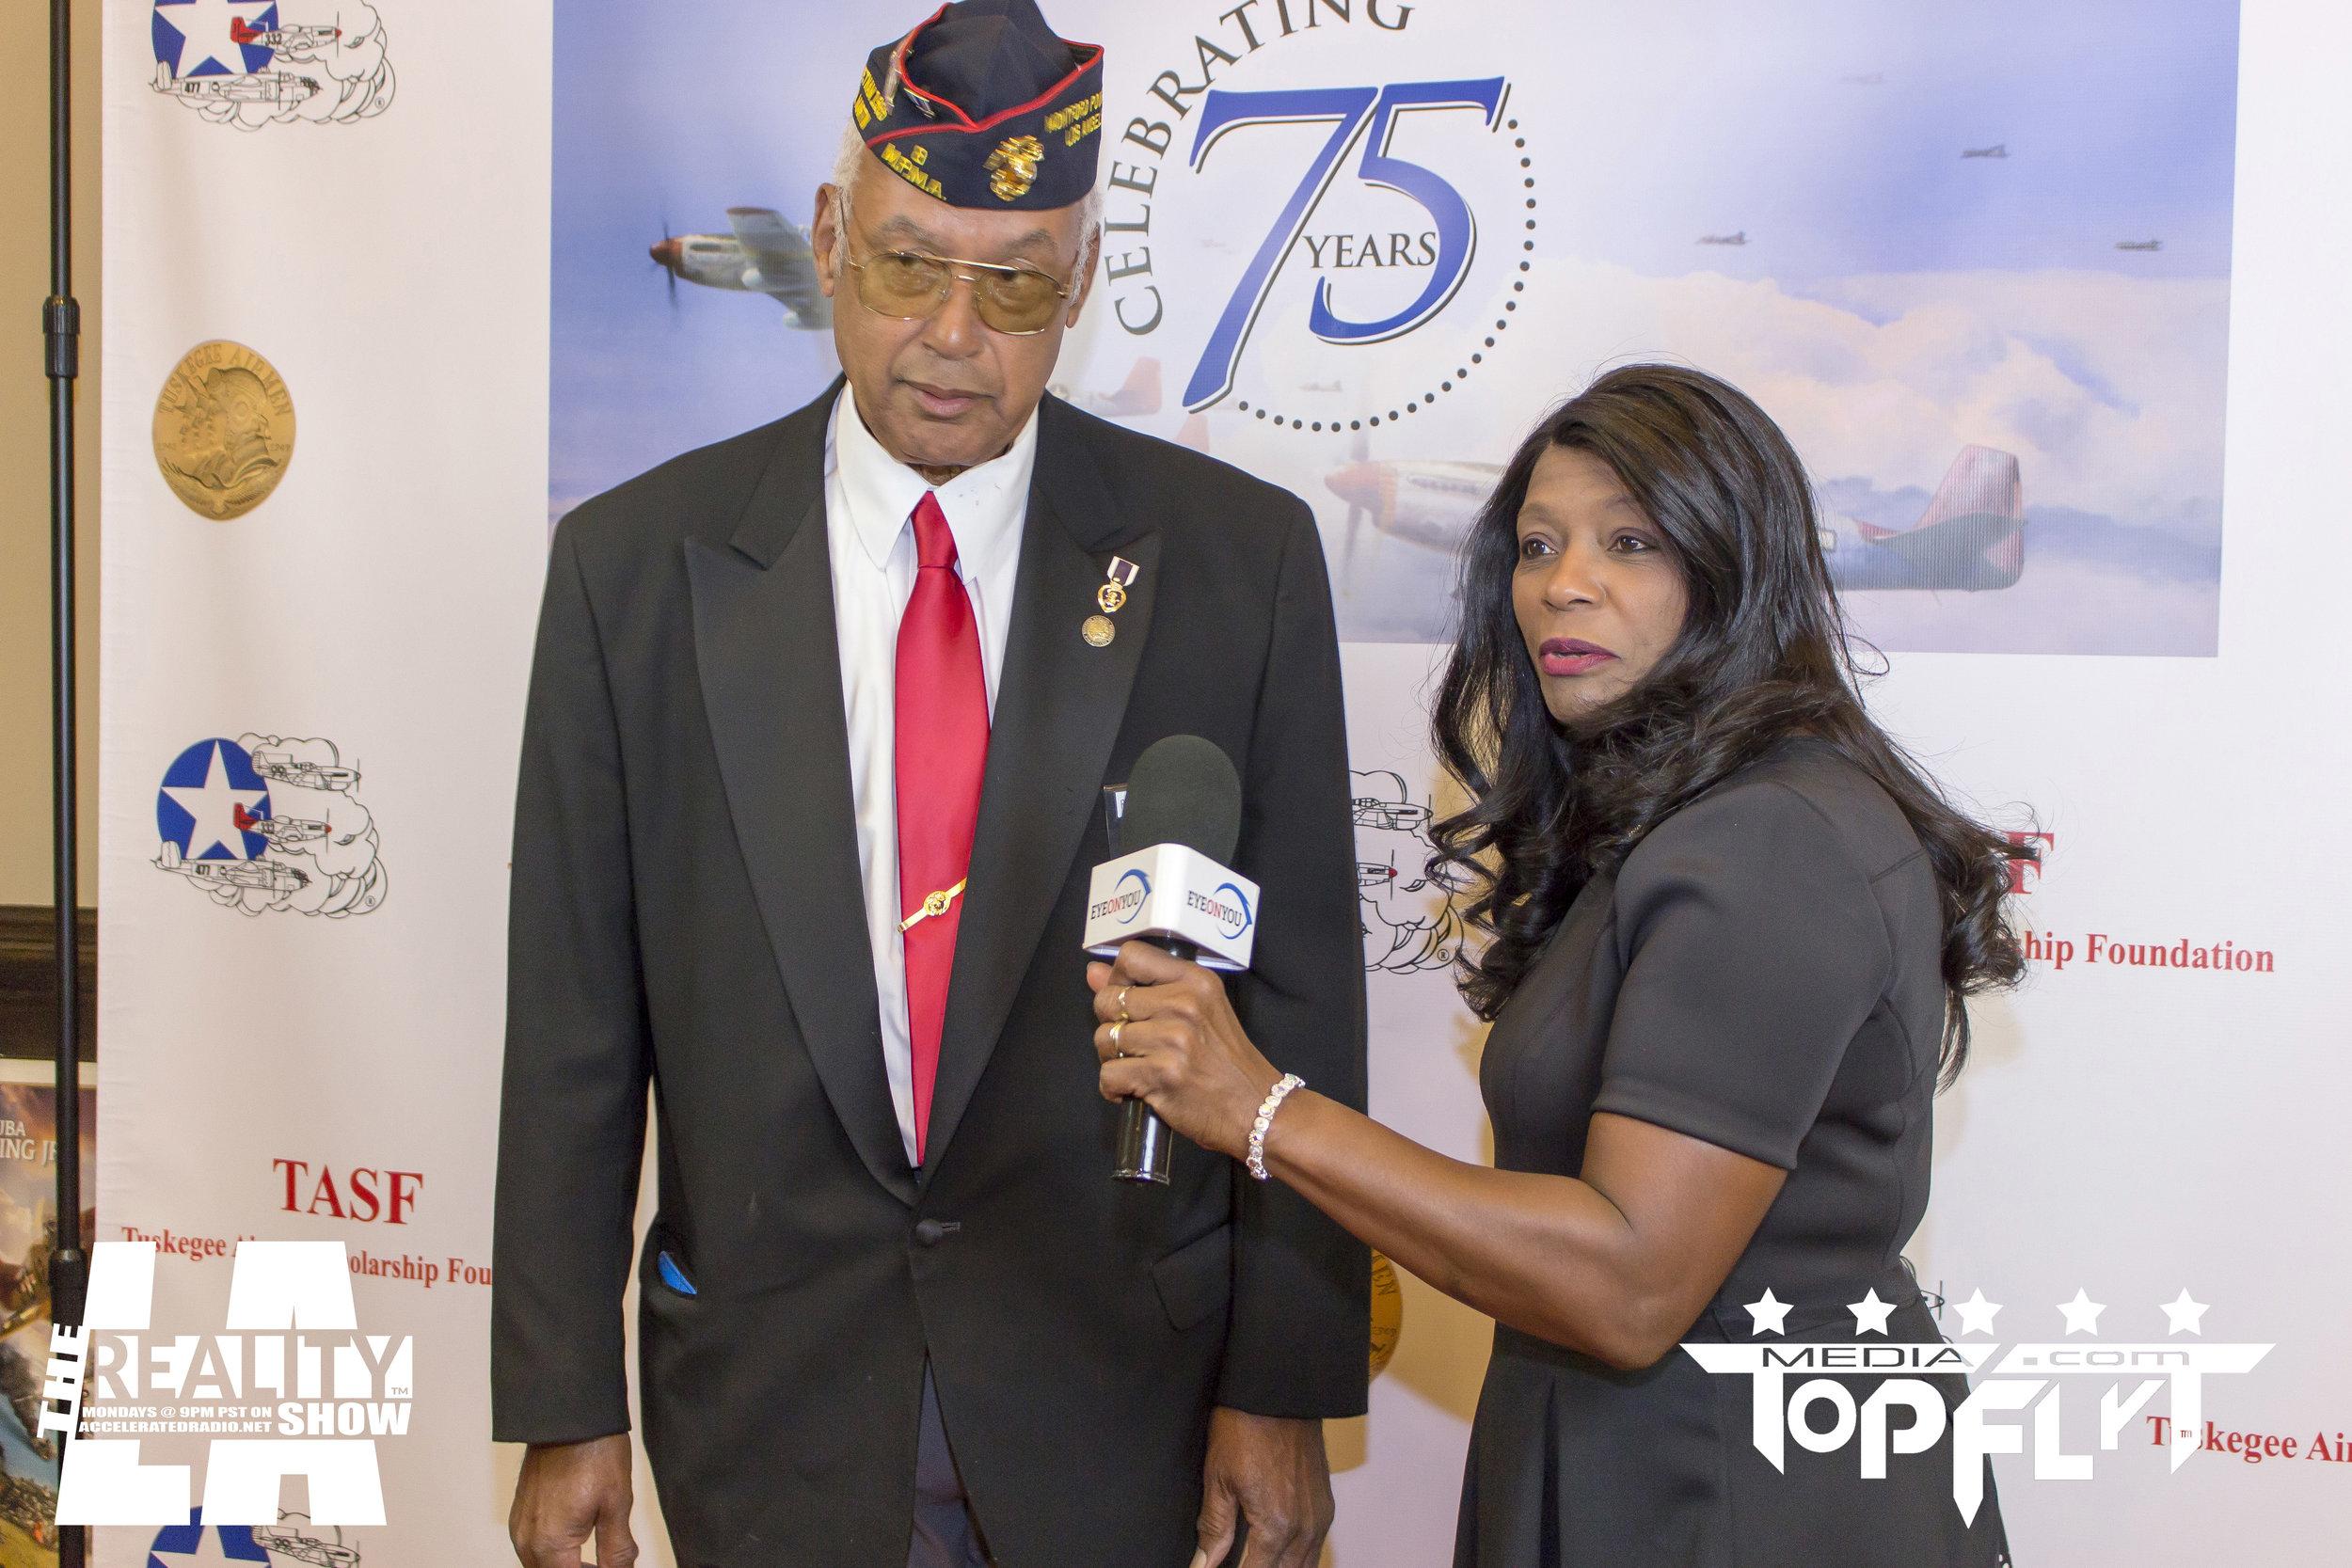 The Reality Show LA - Tuskegee Airmen 75th Anniversary VIP Reception_59.jpg